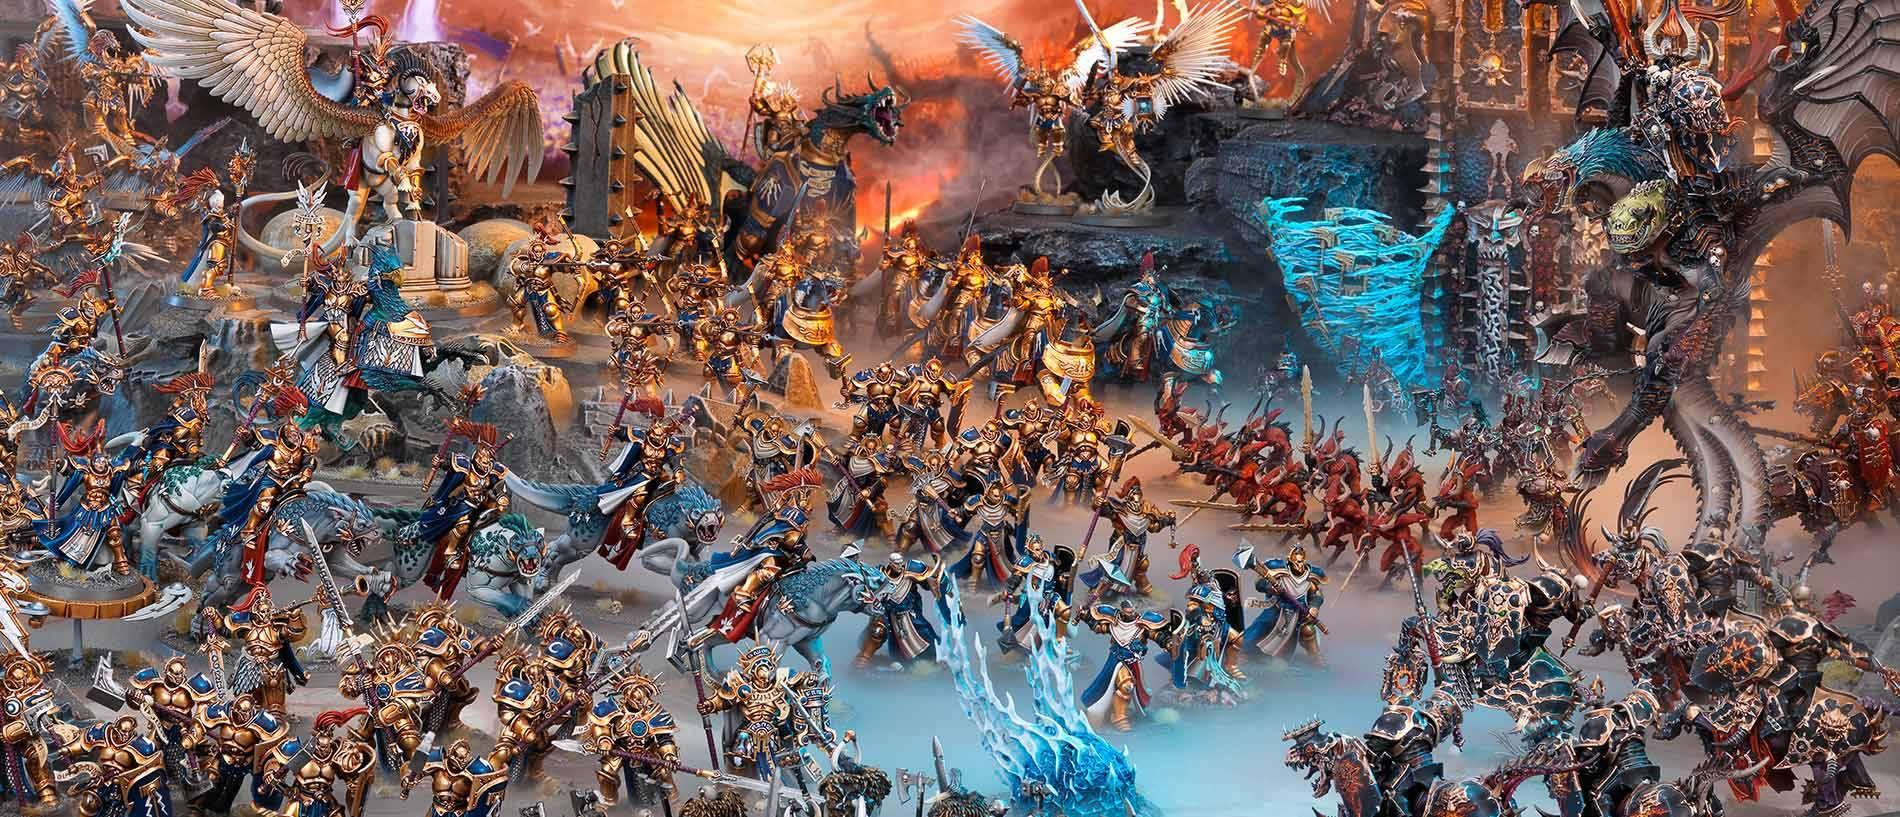 Warhammer Fantasy_4